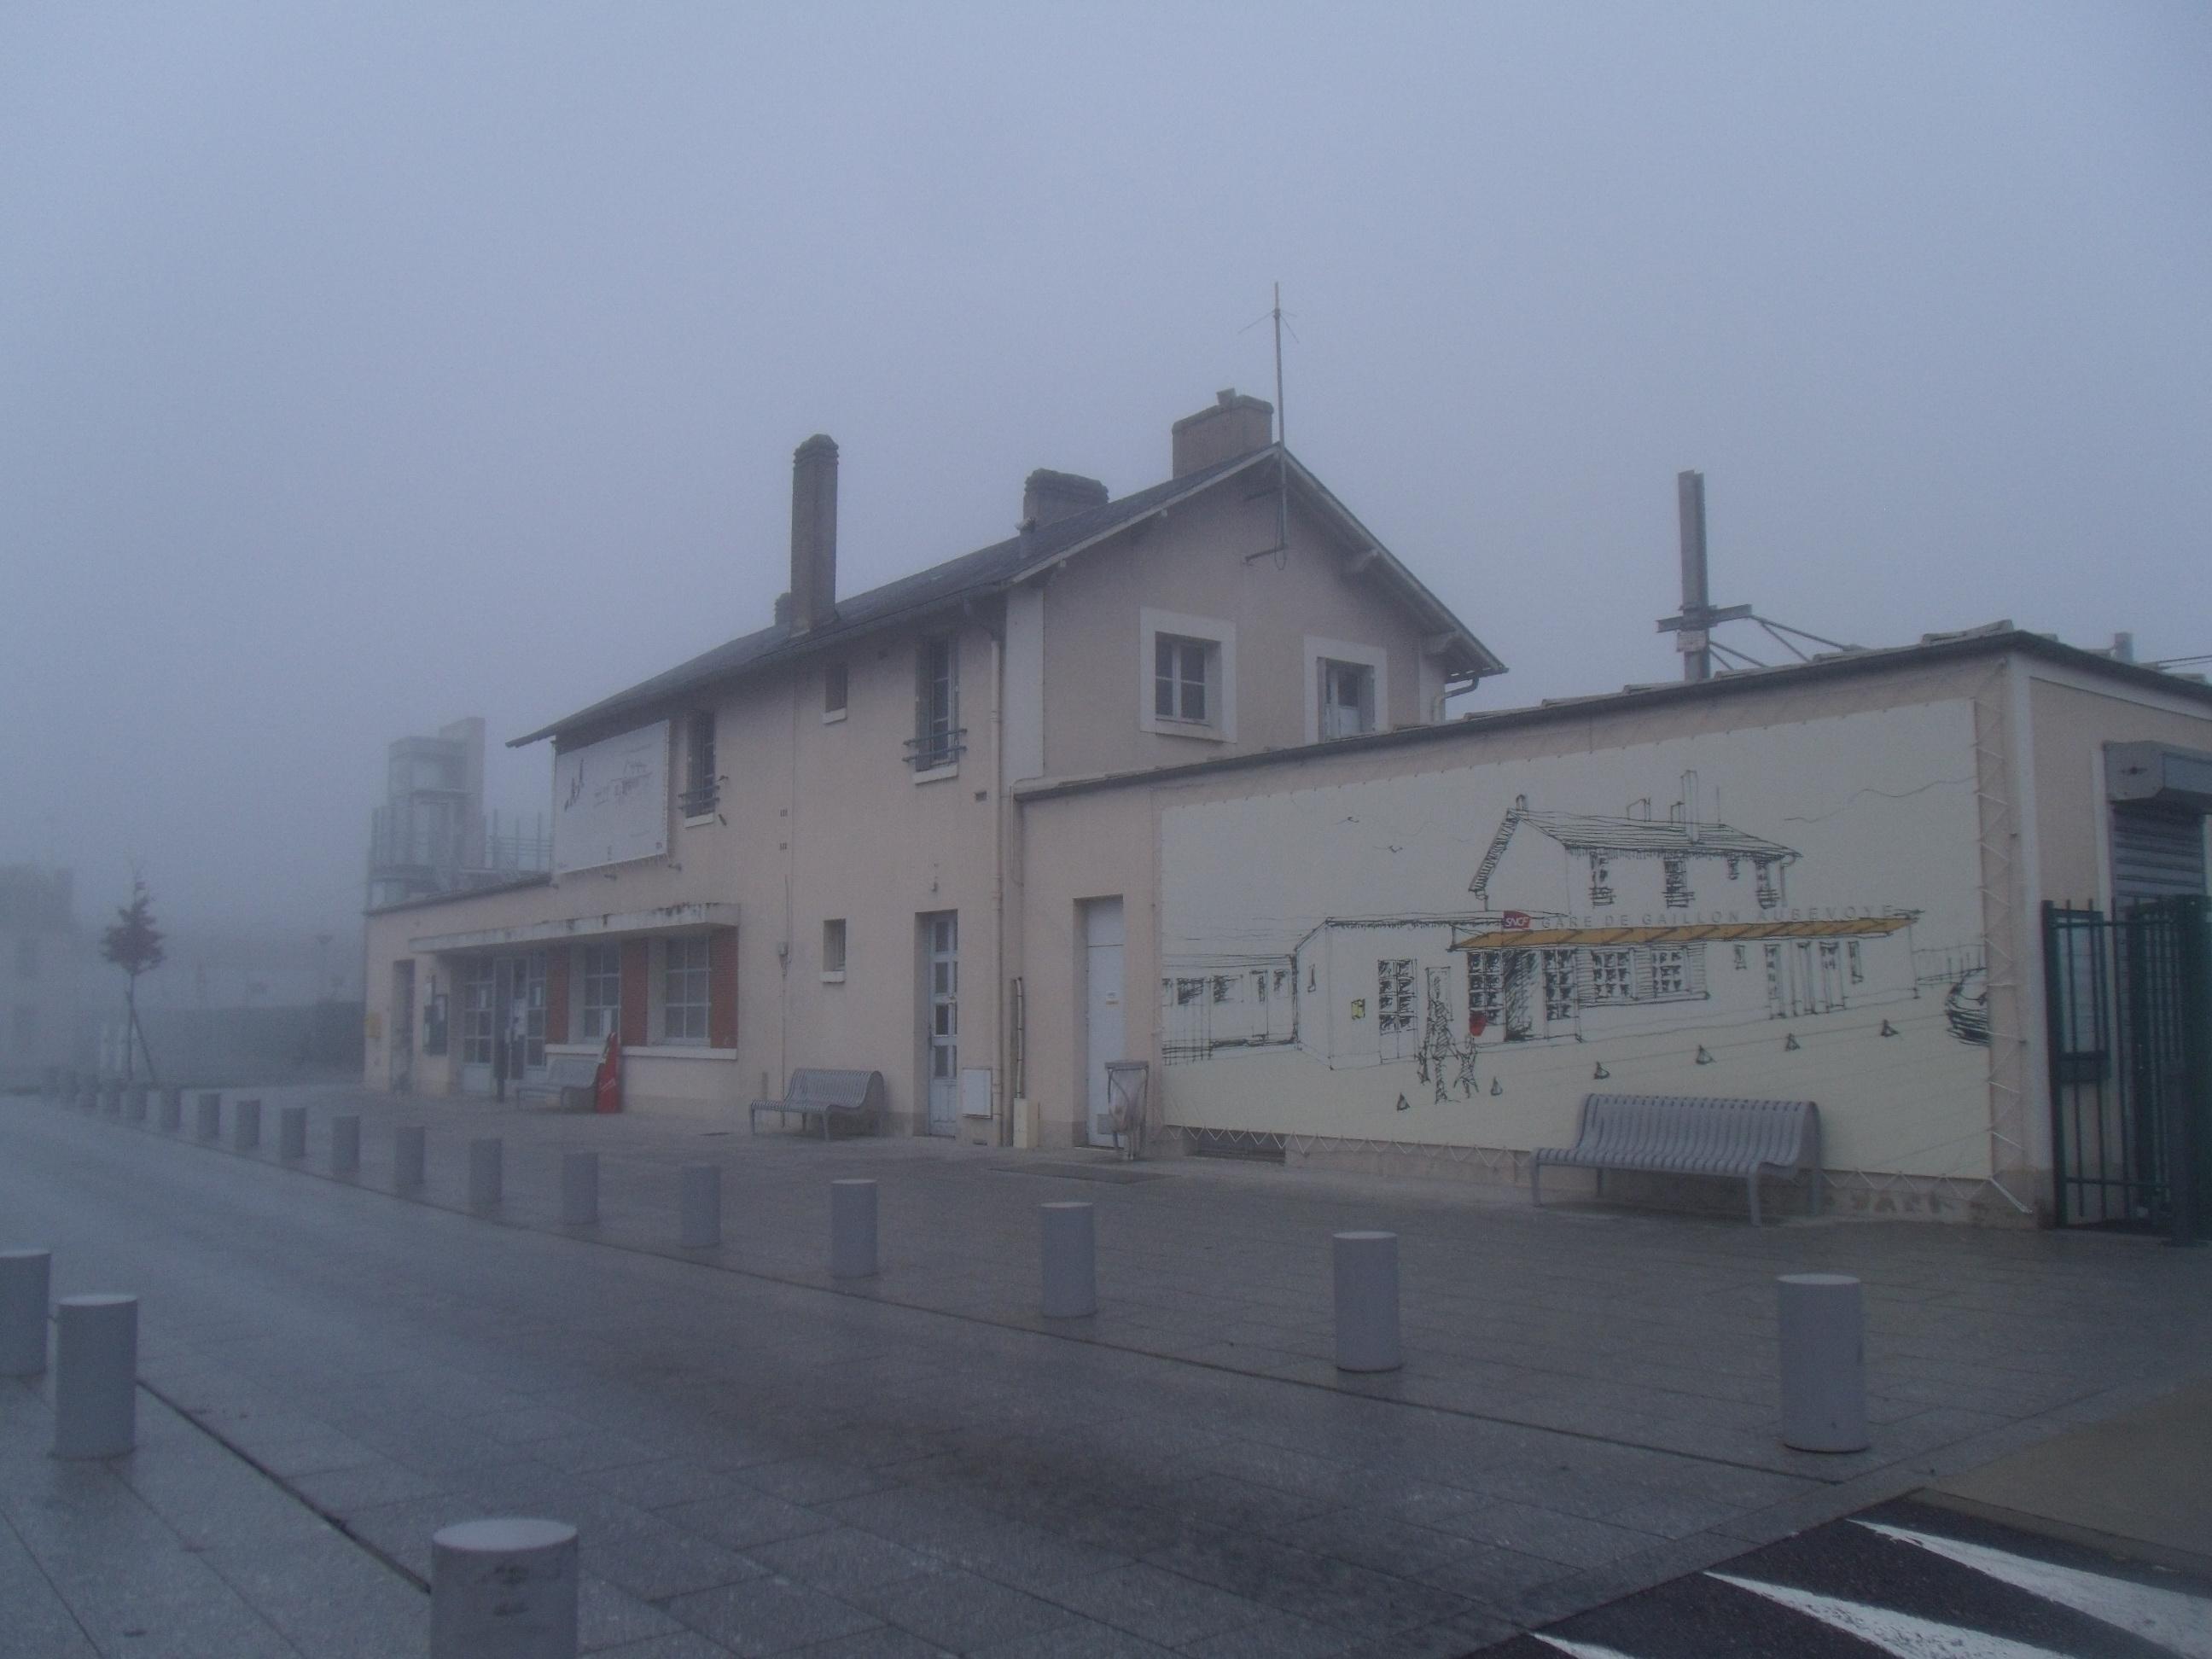 File:Gare de Gaillon - Aubevoye extérieur.JPG